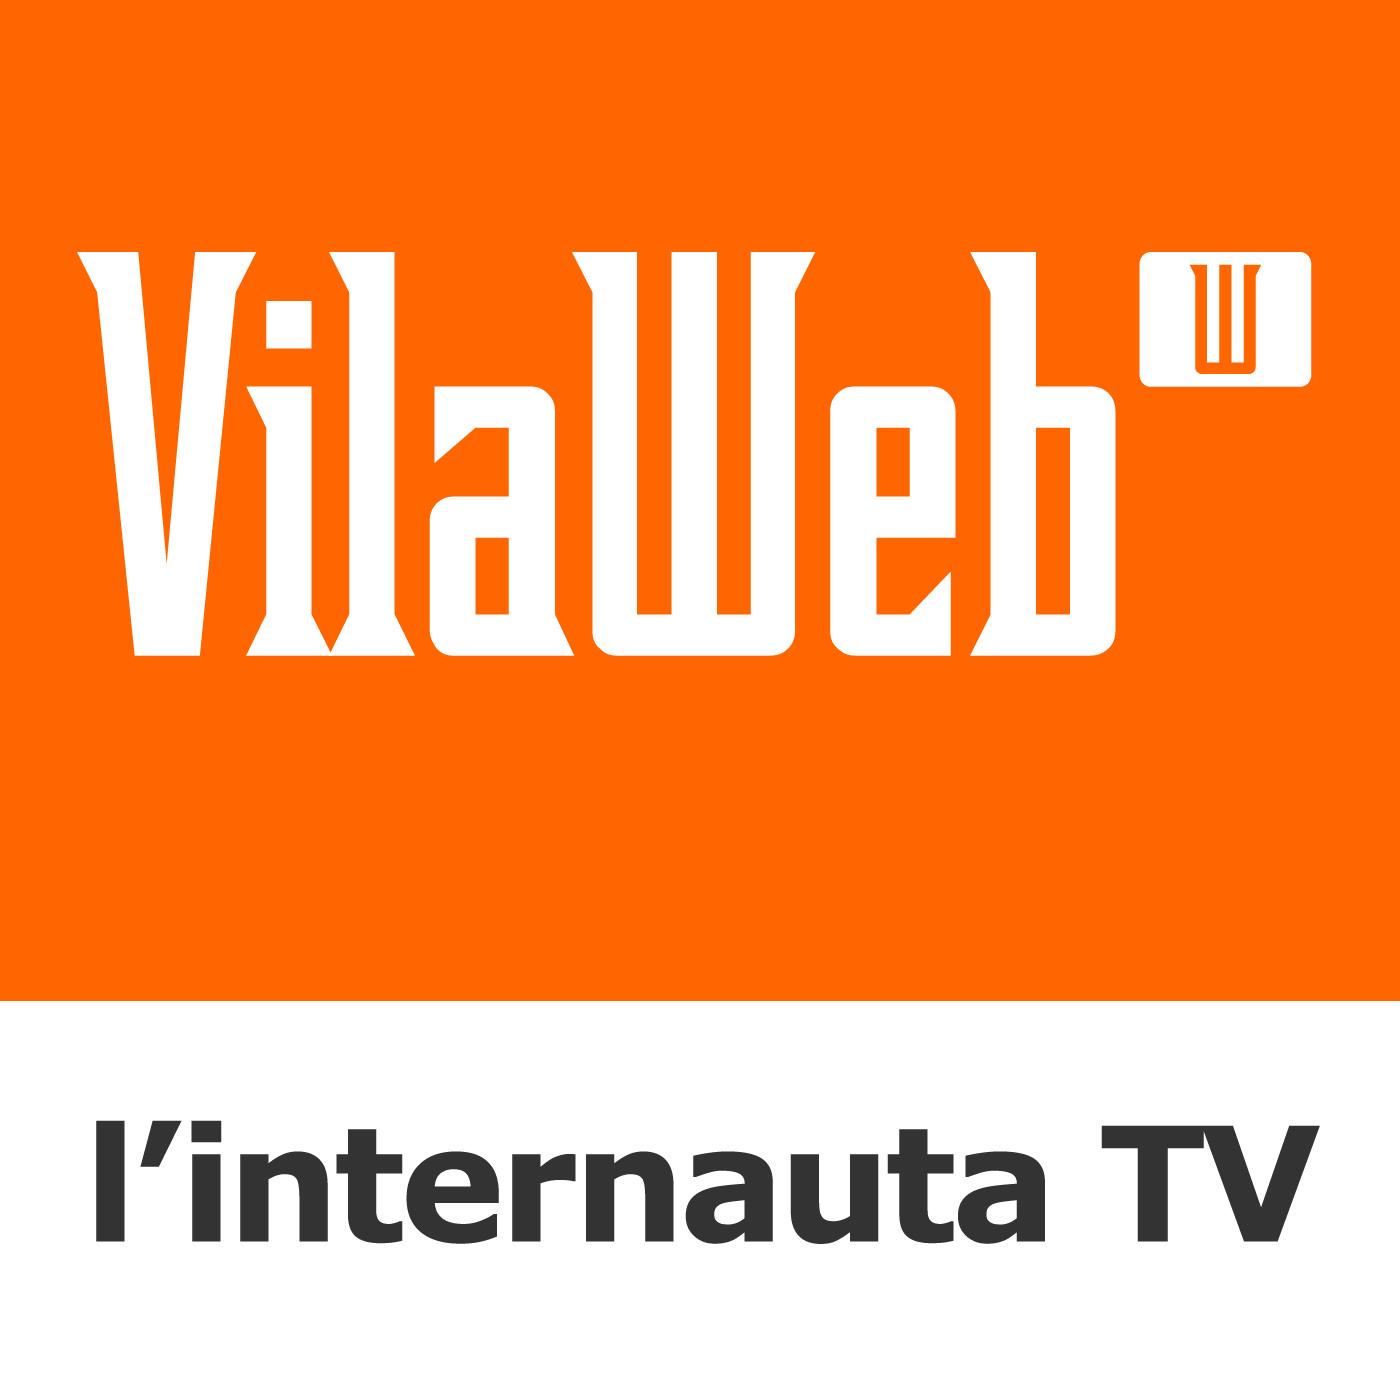 L'internauta - VilaWeb TV